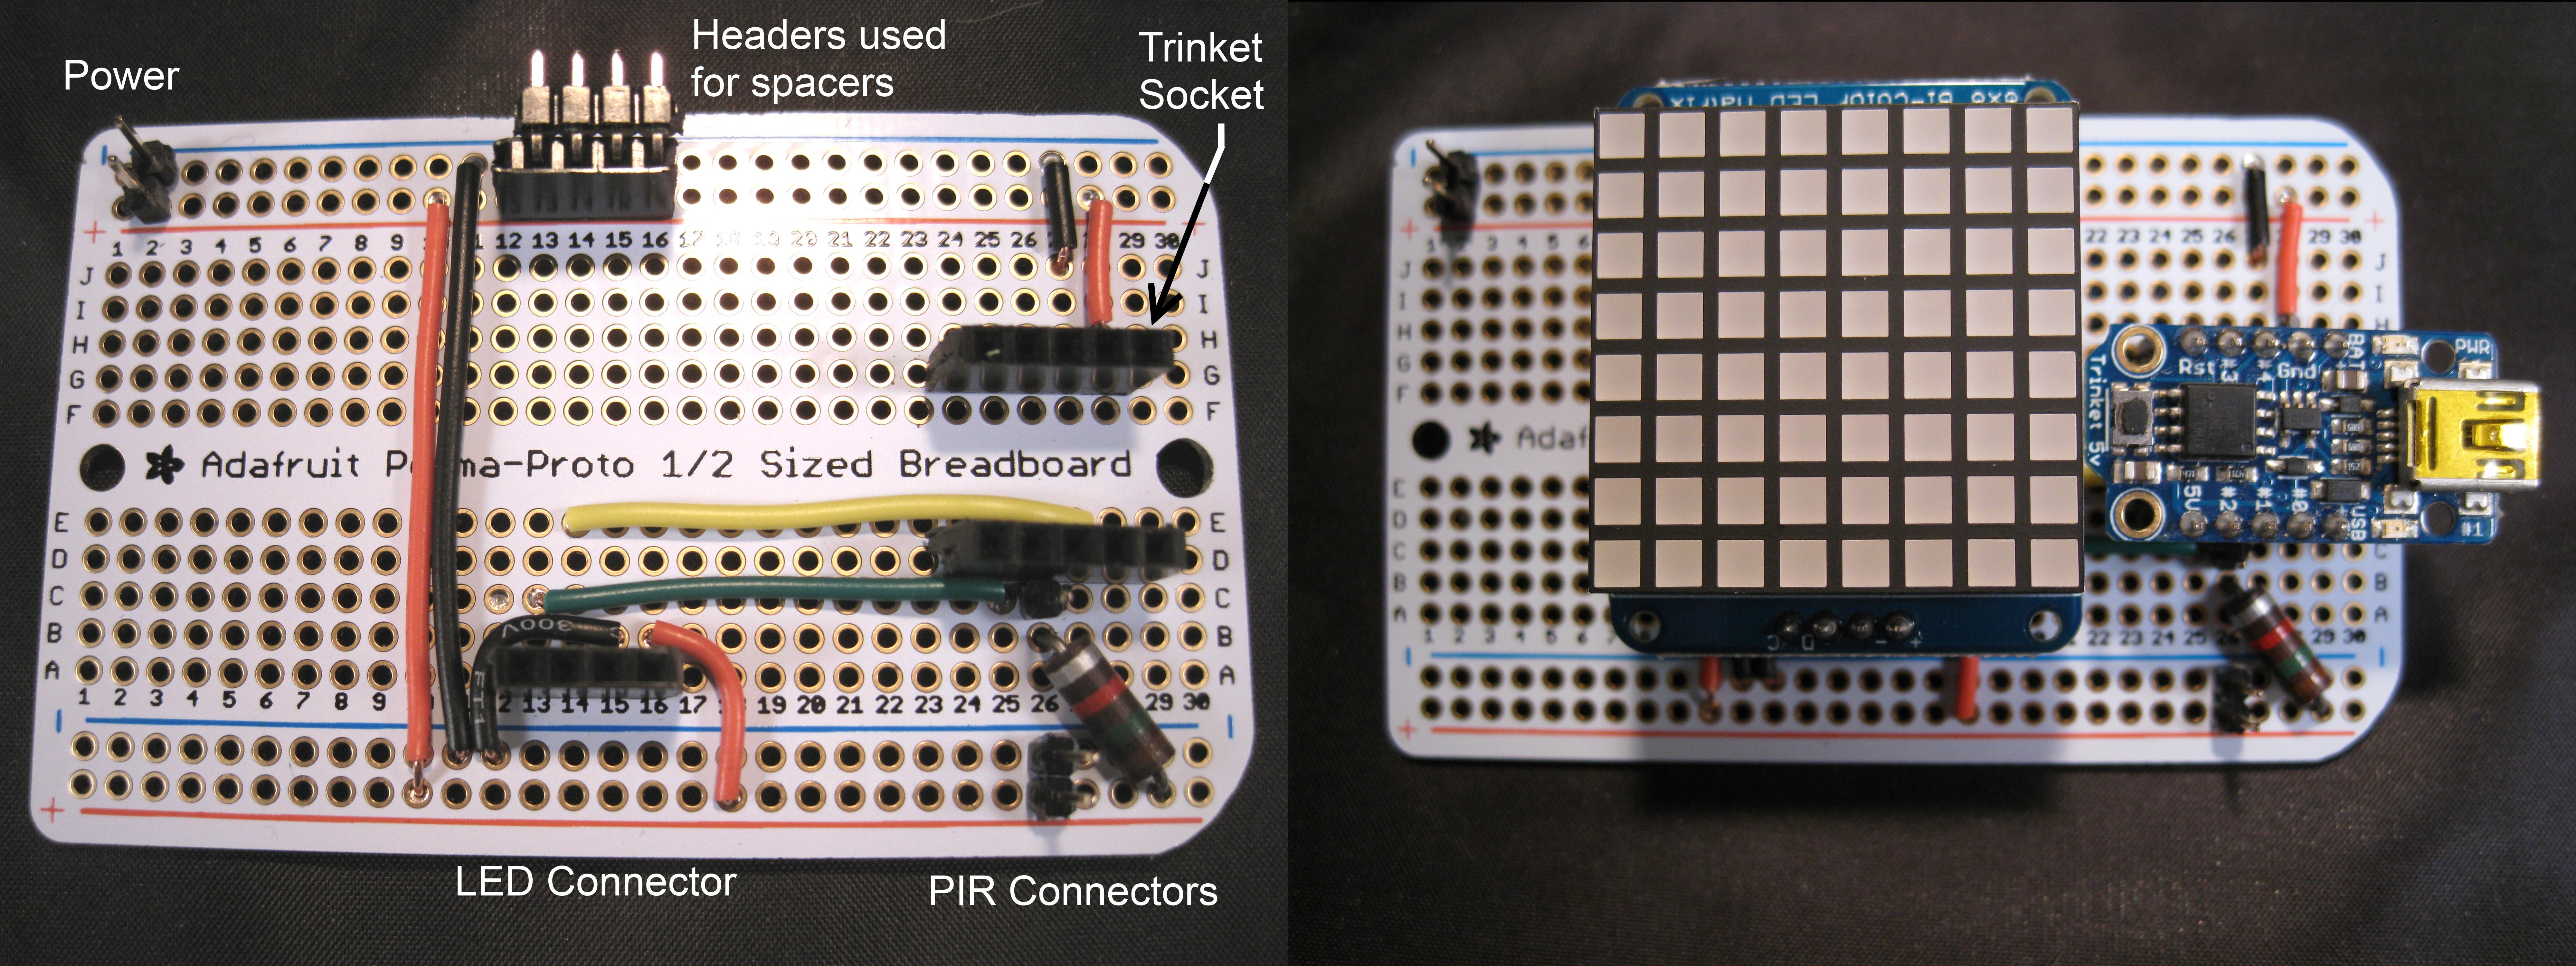 trinket_Board-Annotated-Wide.jpg